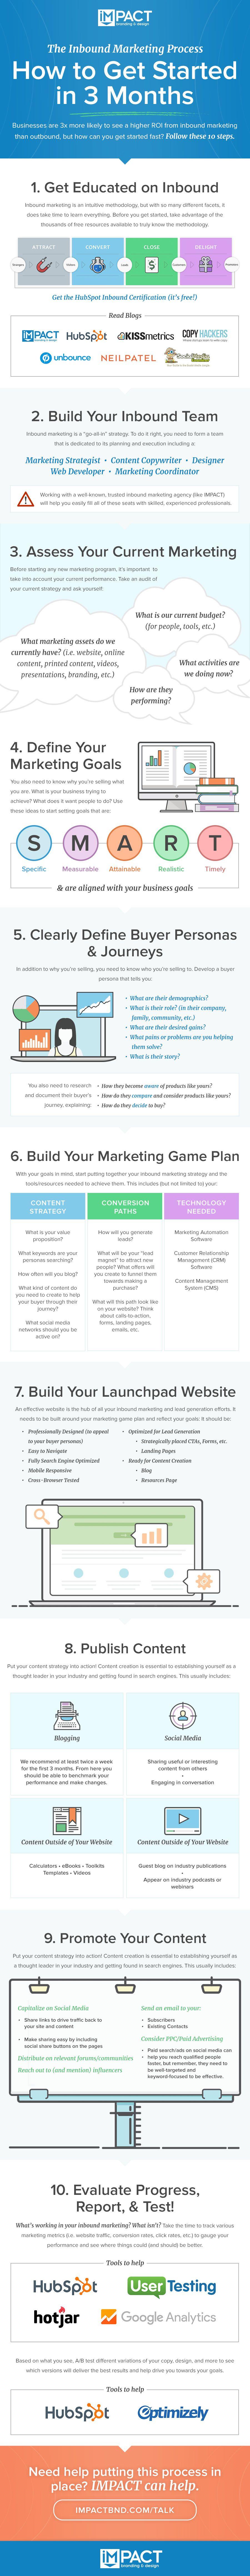 inbound-marketing-process-infographic-full.jpg